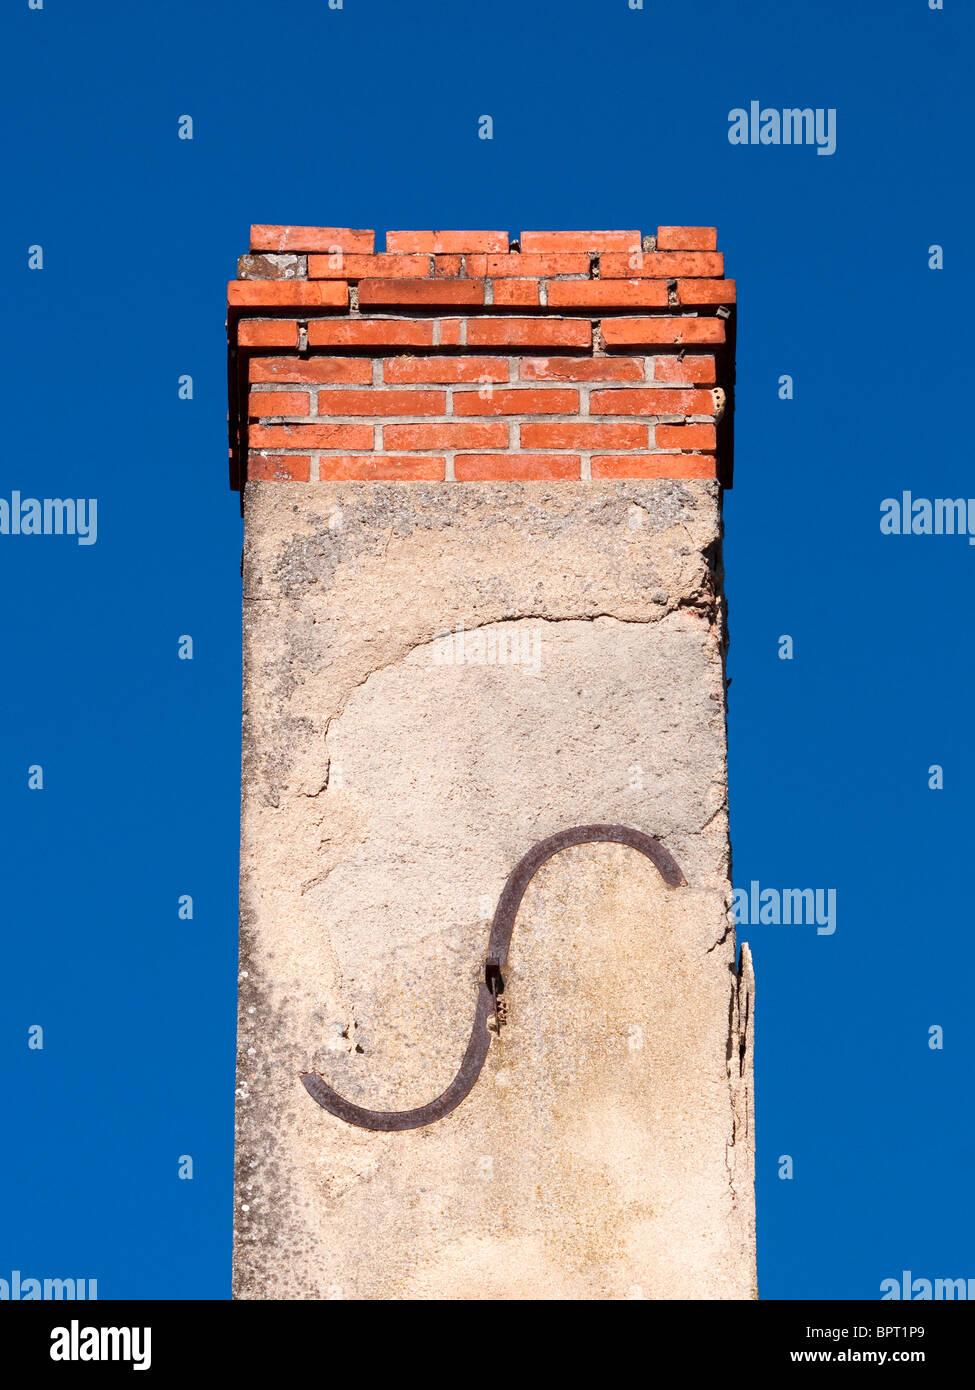 Iron letter 'S' on brick chimney stack - Indre-et-Loire, France. - Stock Image